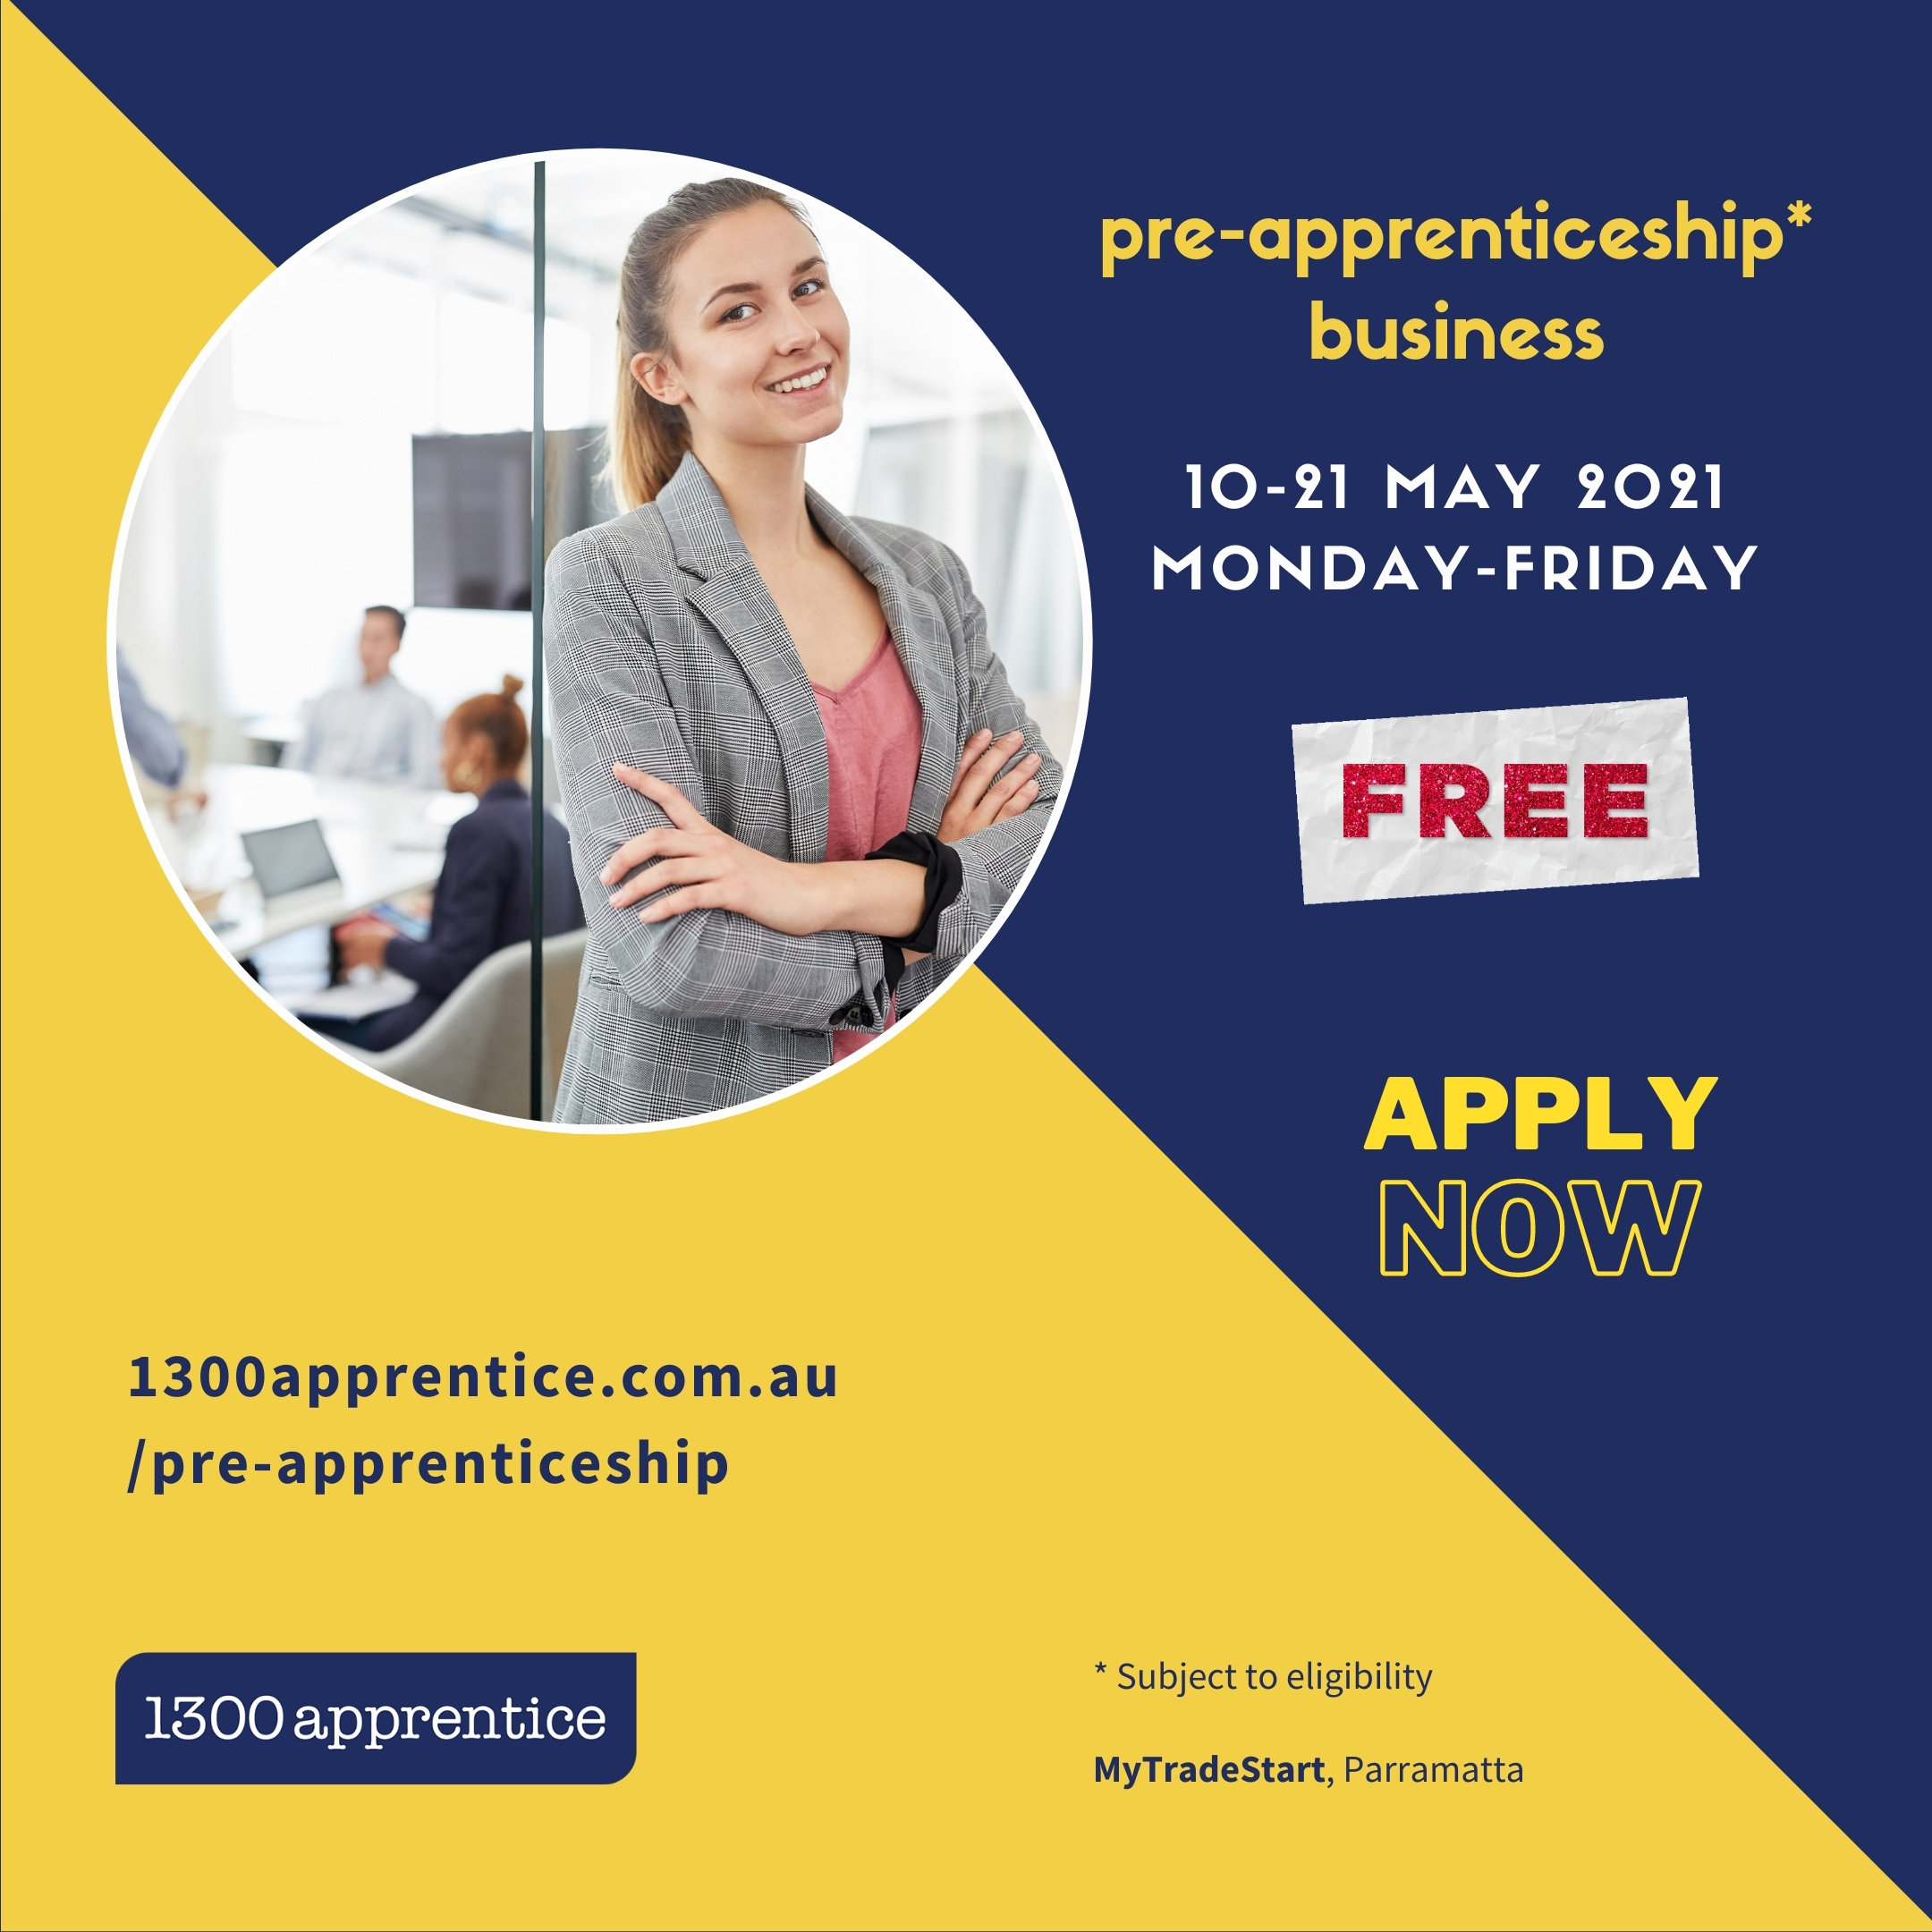 pre-apprenticeship business 2021